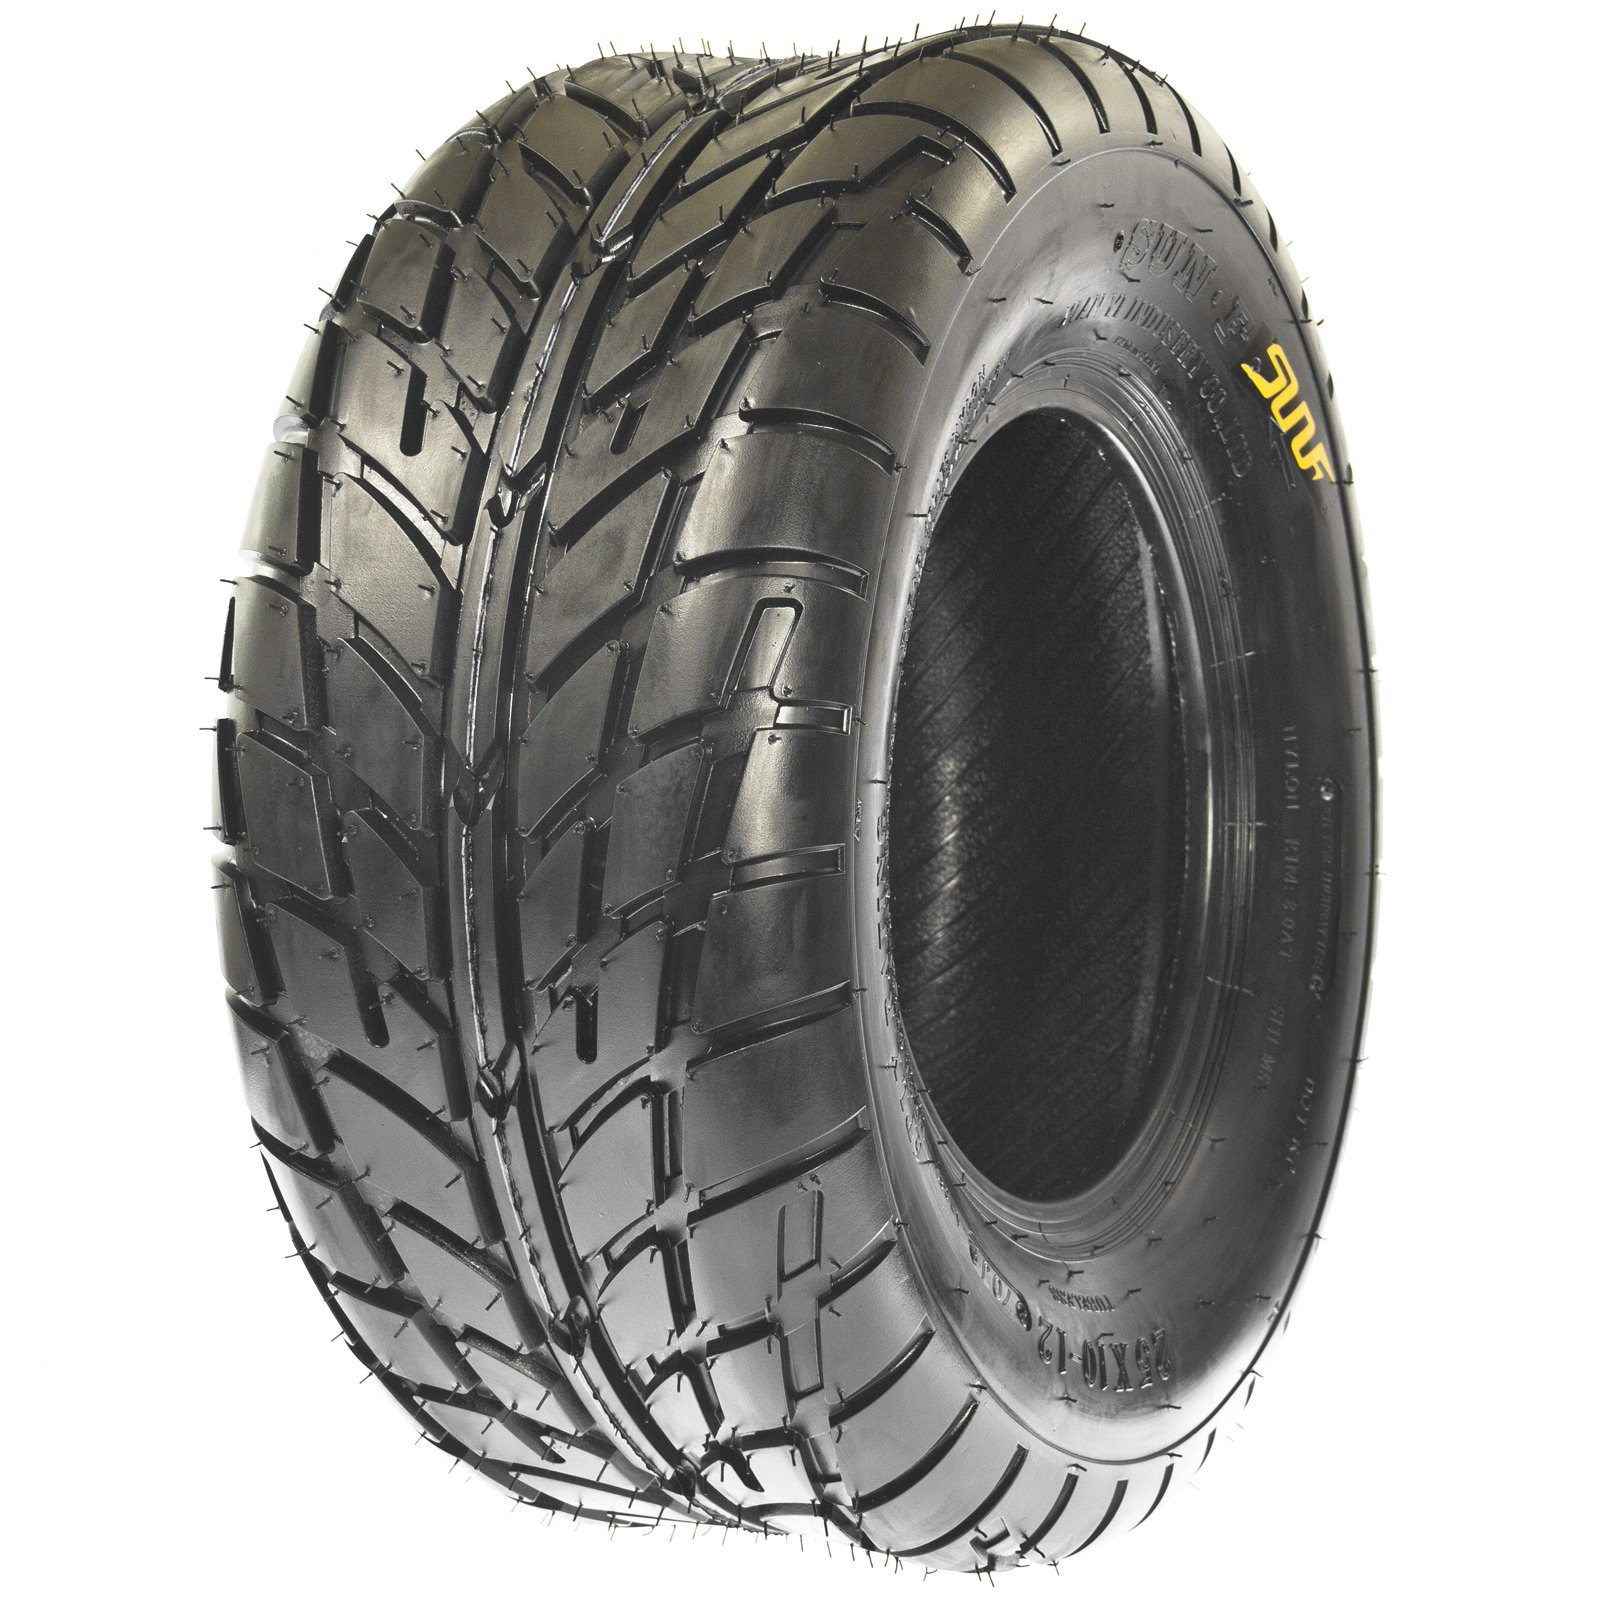 SunF Quad ATV Road Race Tires 225/45-10 225 45 10 4 PR A021 (Full set of 4) by SunF (Image #9)